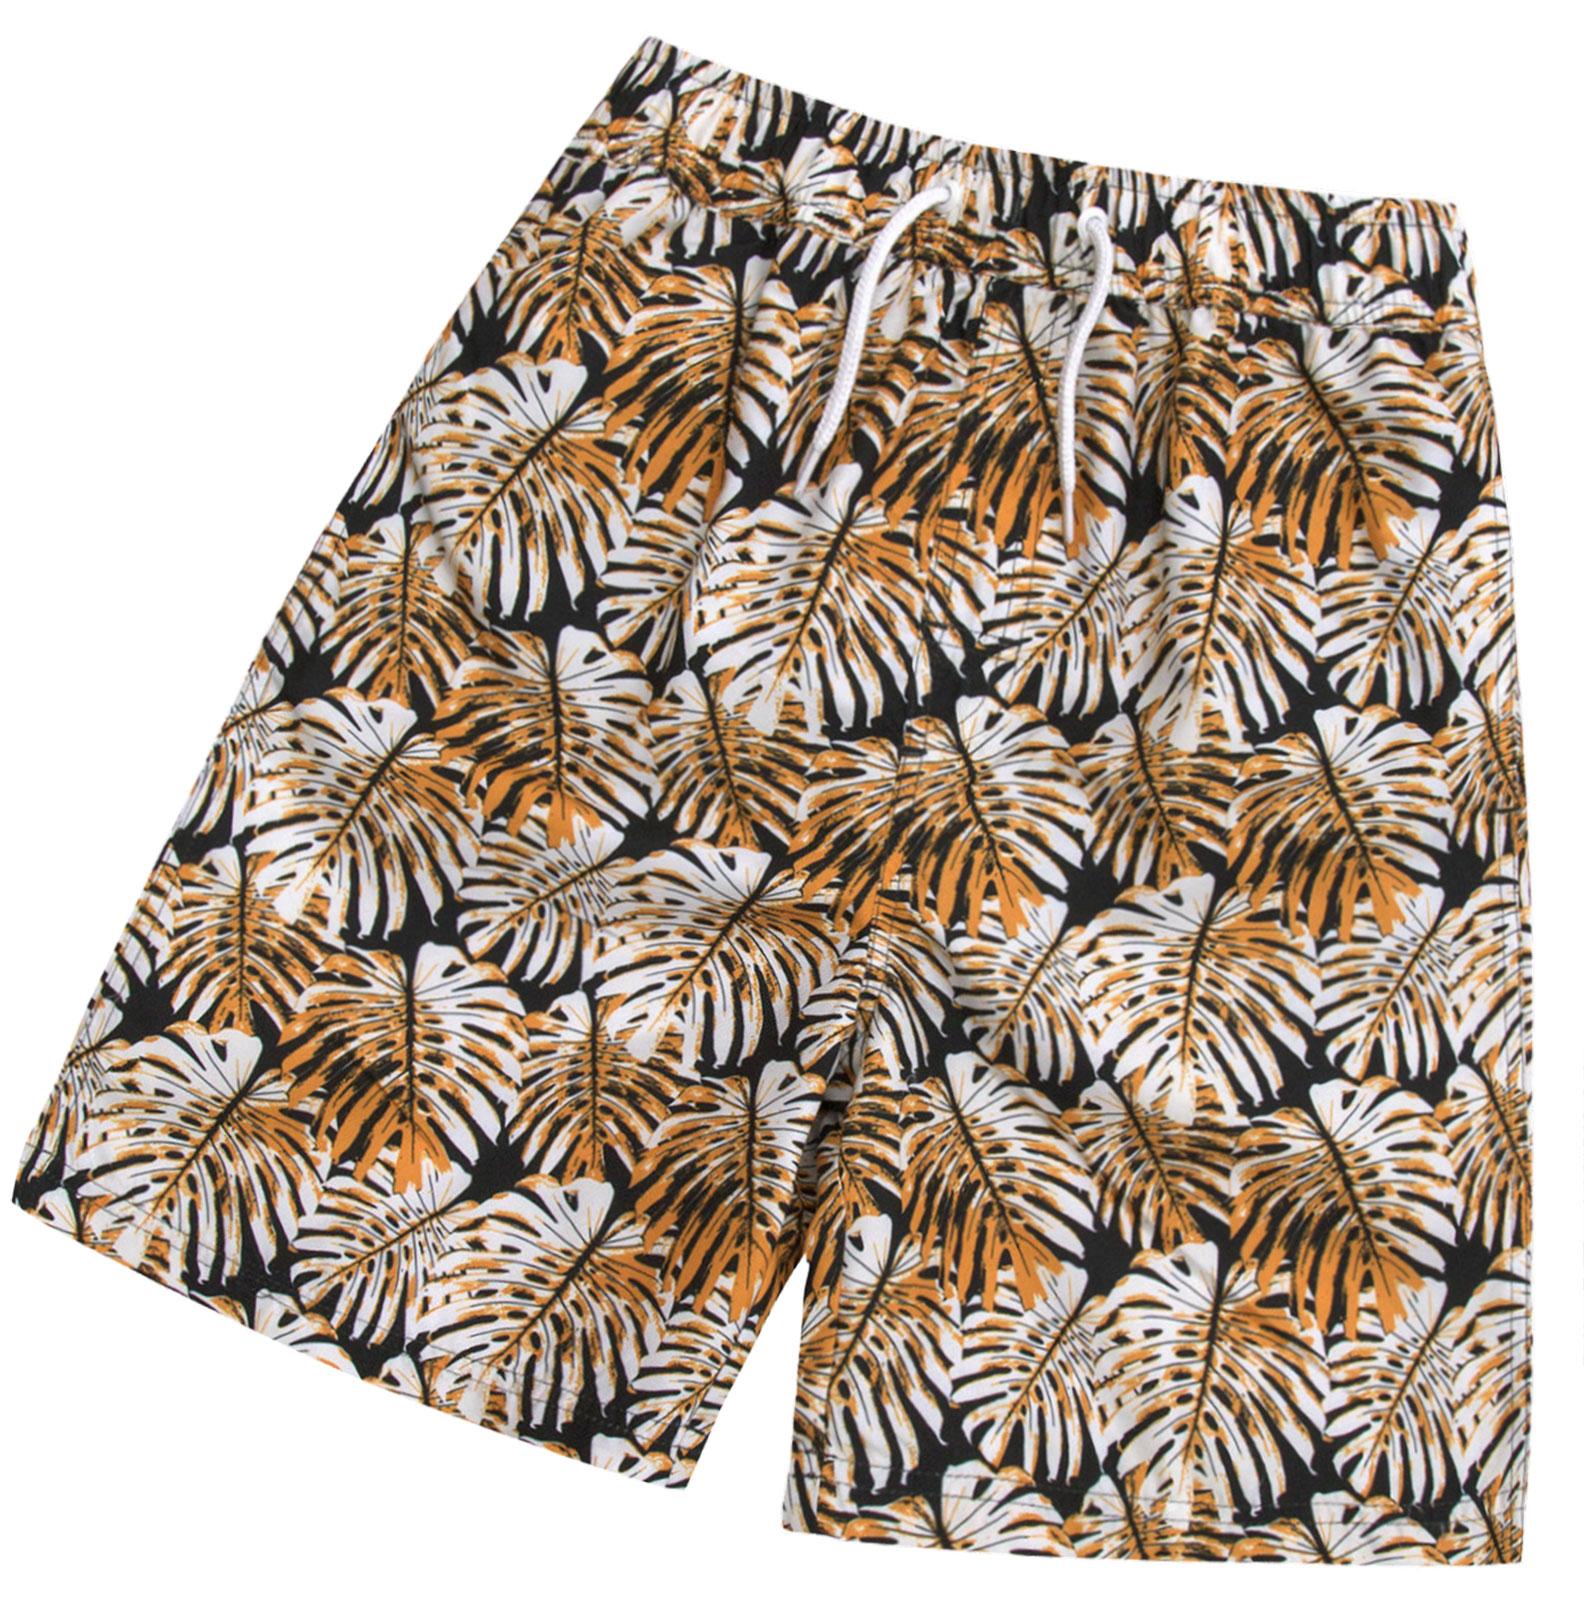 Boys-Swimming-Shorts-Kids-Bermuda-Holiday-Trunks-2-3-4-5-6-7-8-9-10-11-12-13-Yrs thumbnail 9